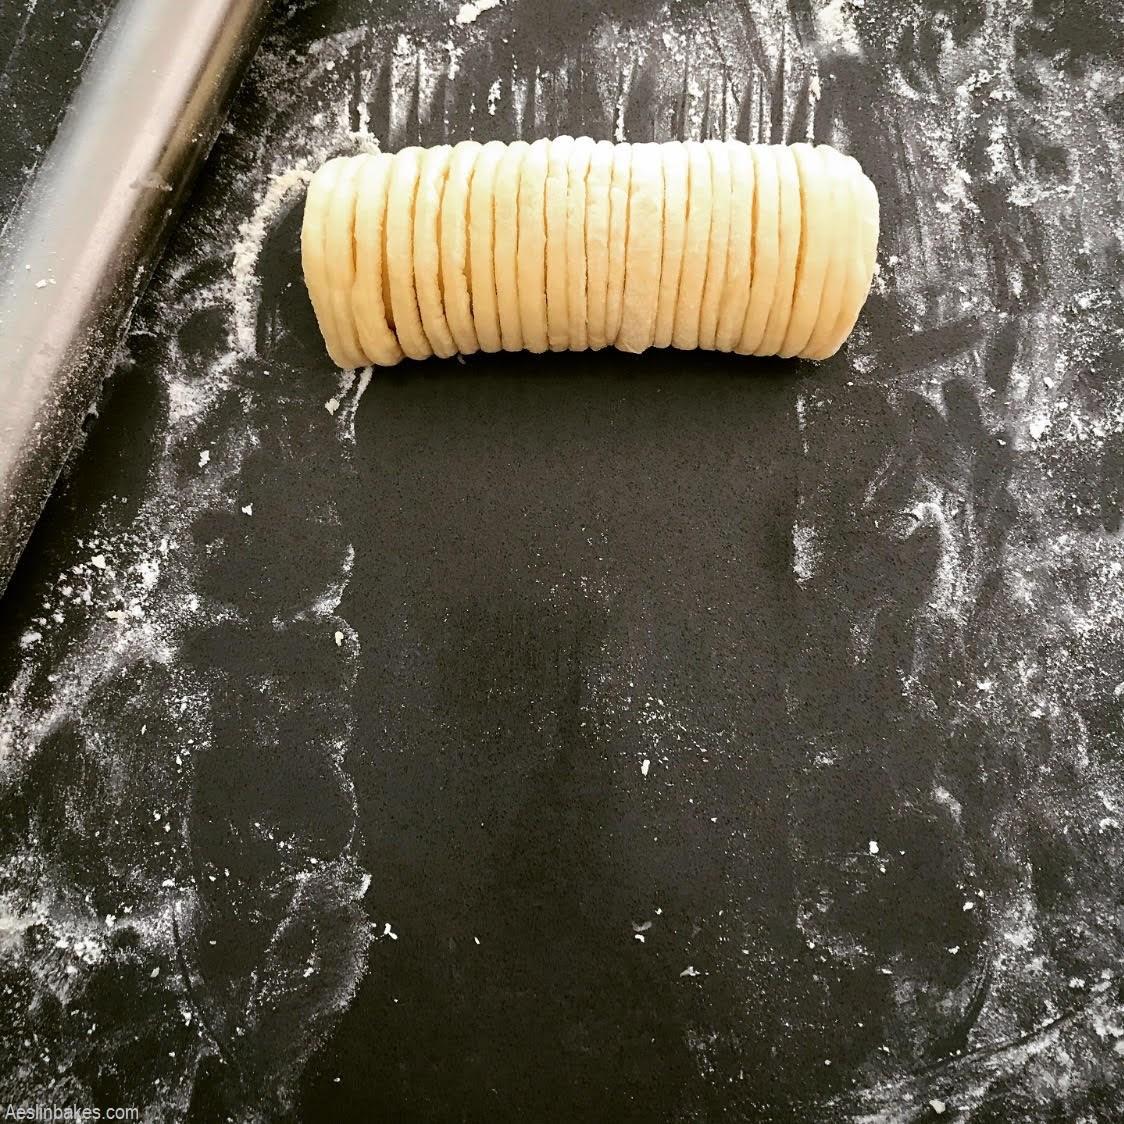 brioche wool roll loaf segment rolled up